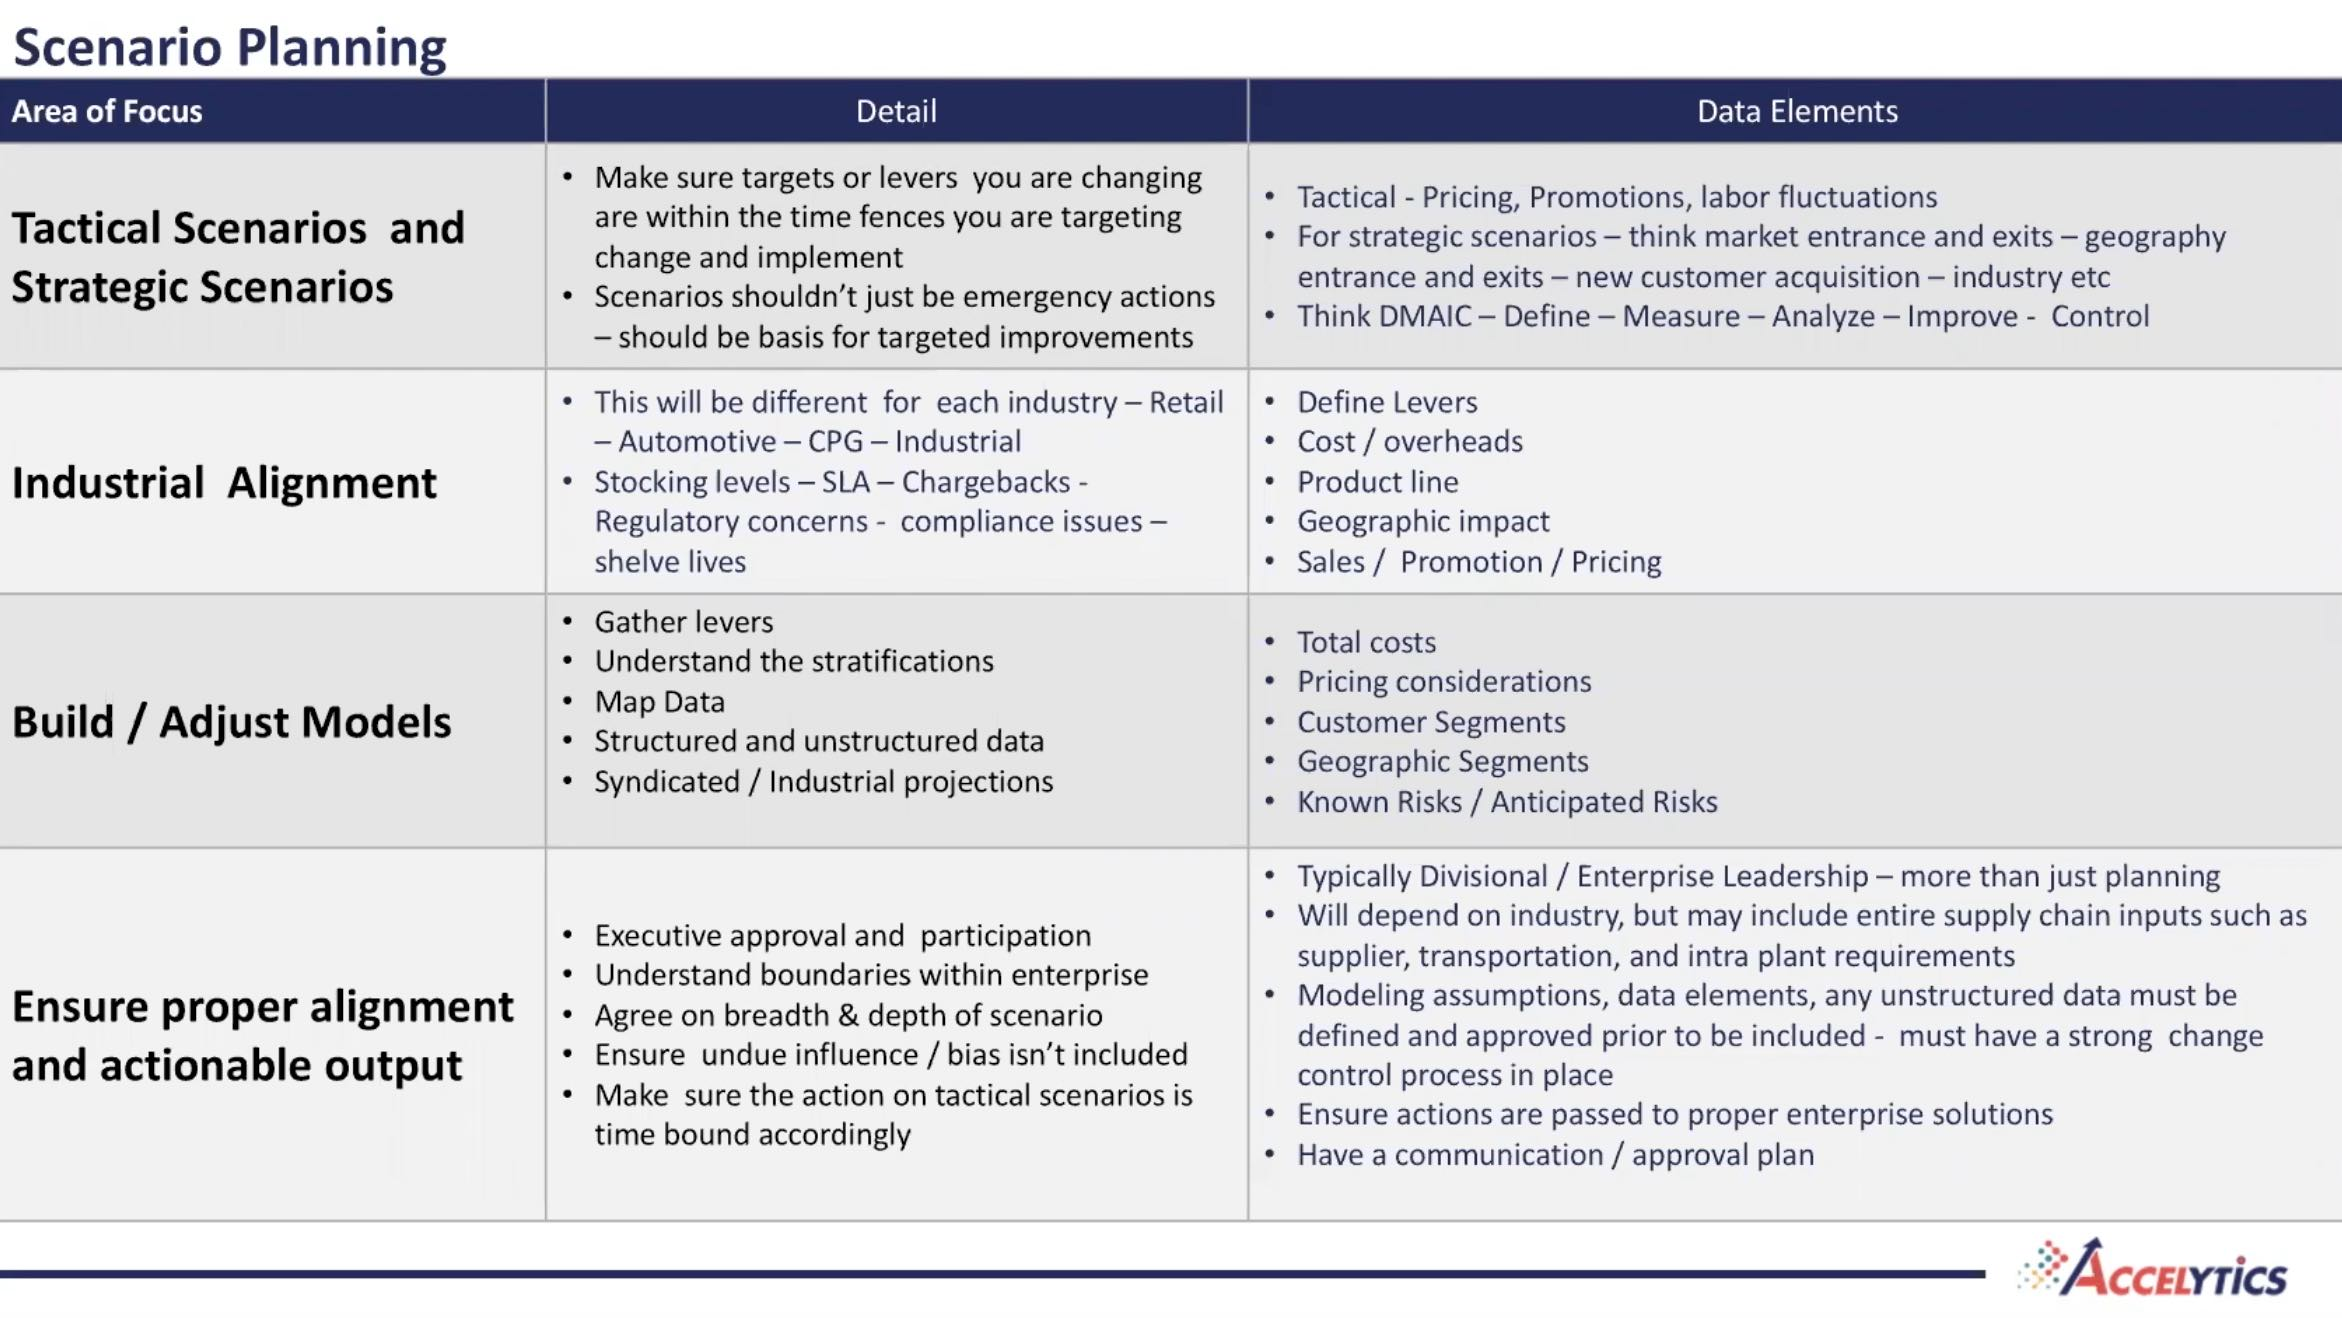 scenario planning elements